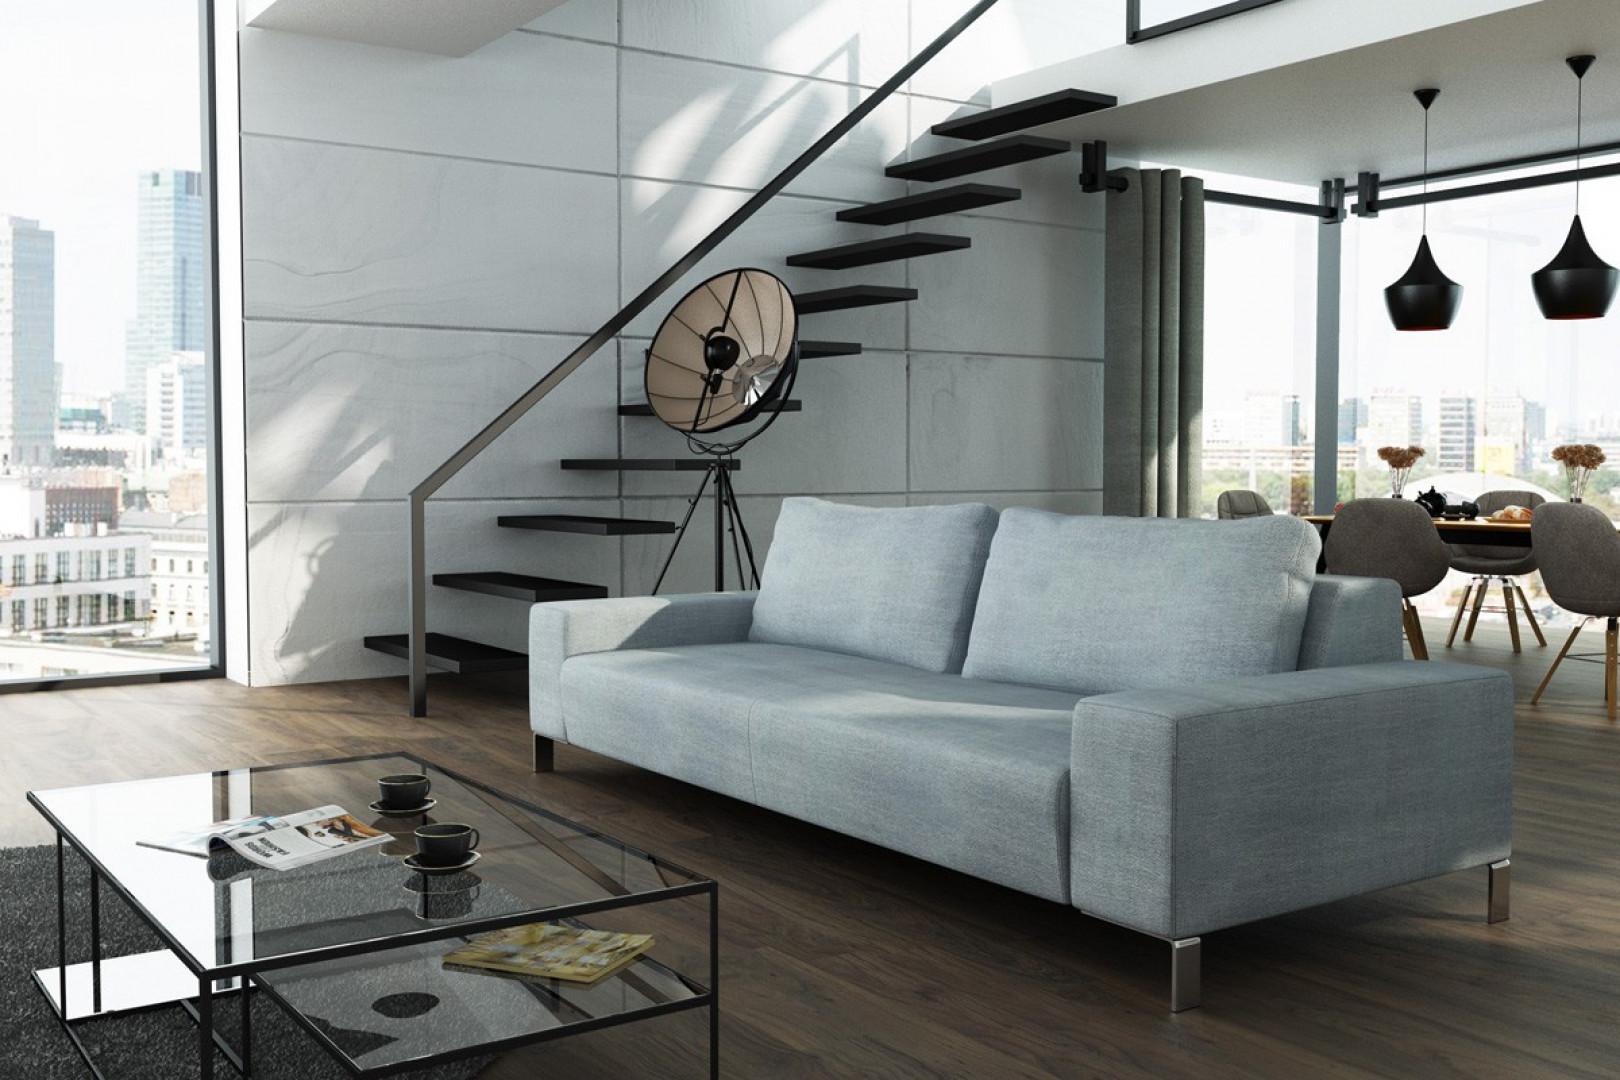 Szara sofa LeMans pasuje do stylu loft. Fot. Adriana Furniture